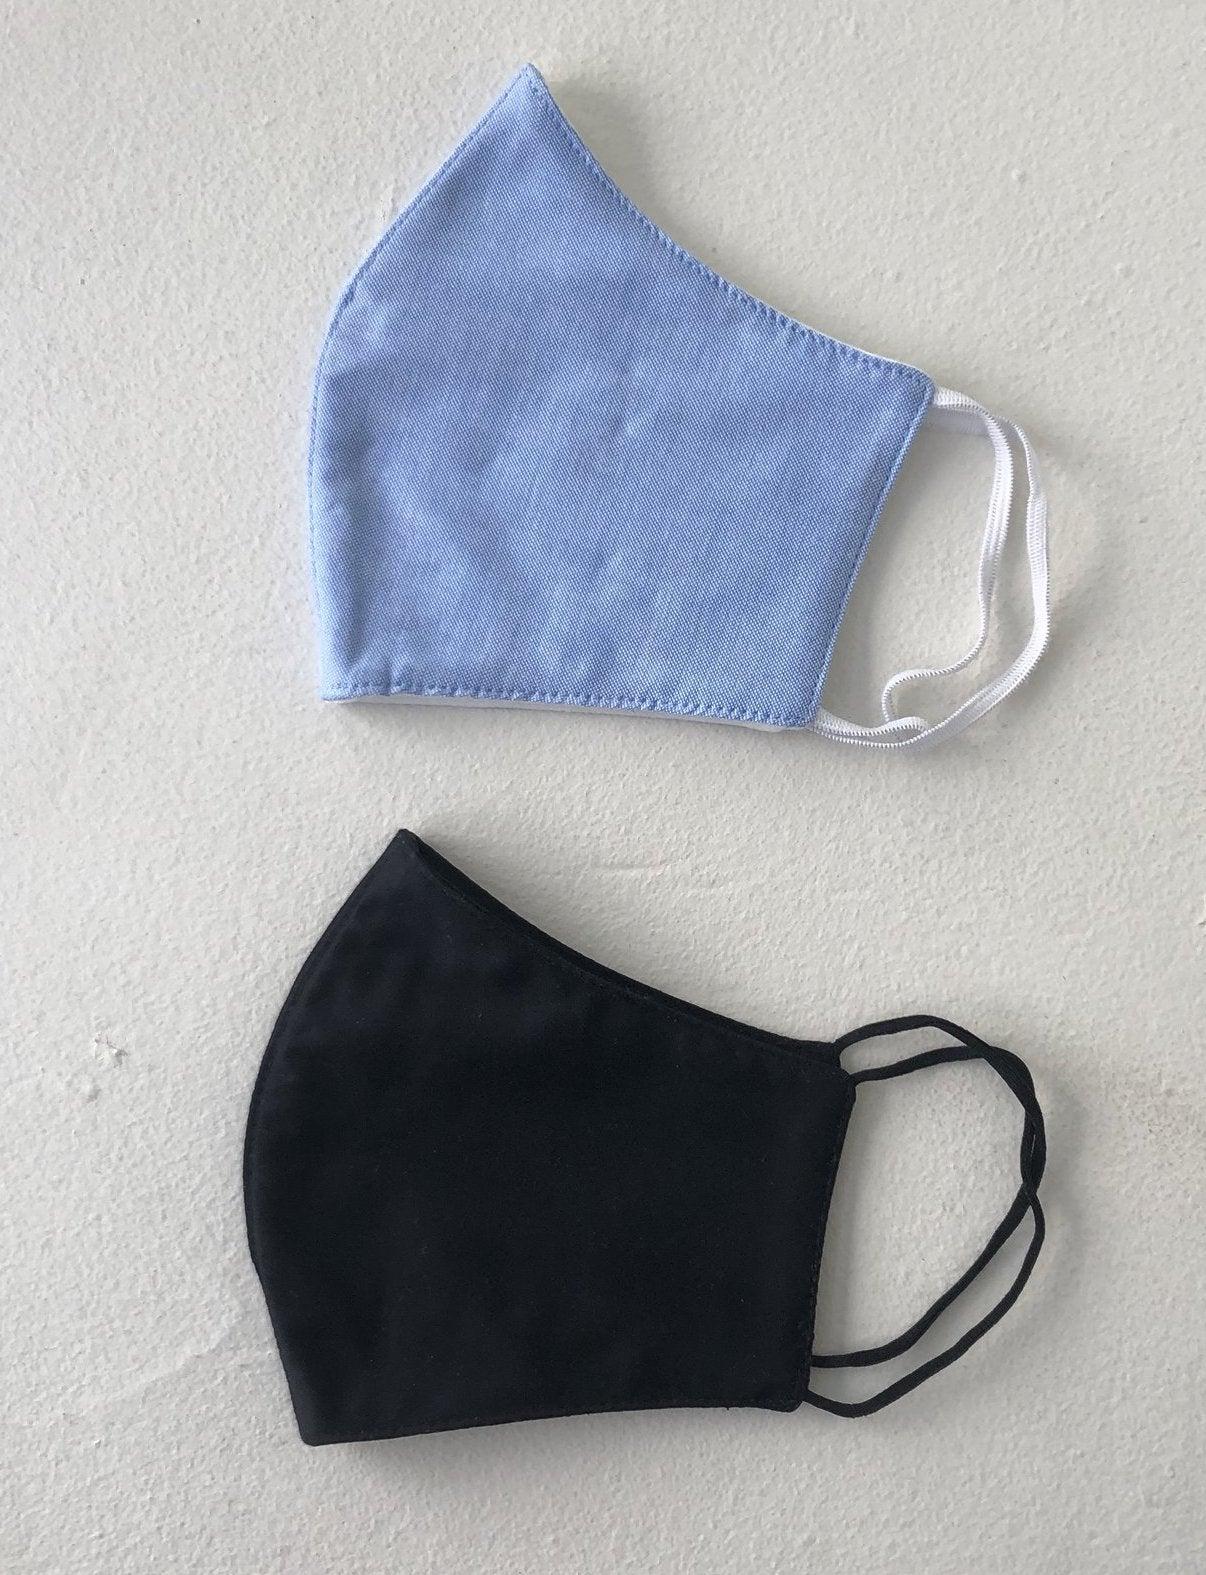 3-Layer Washable Face Mask (Pack of 5, Unisex)